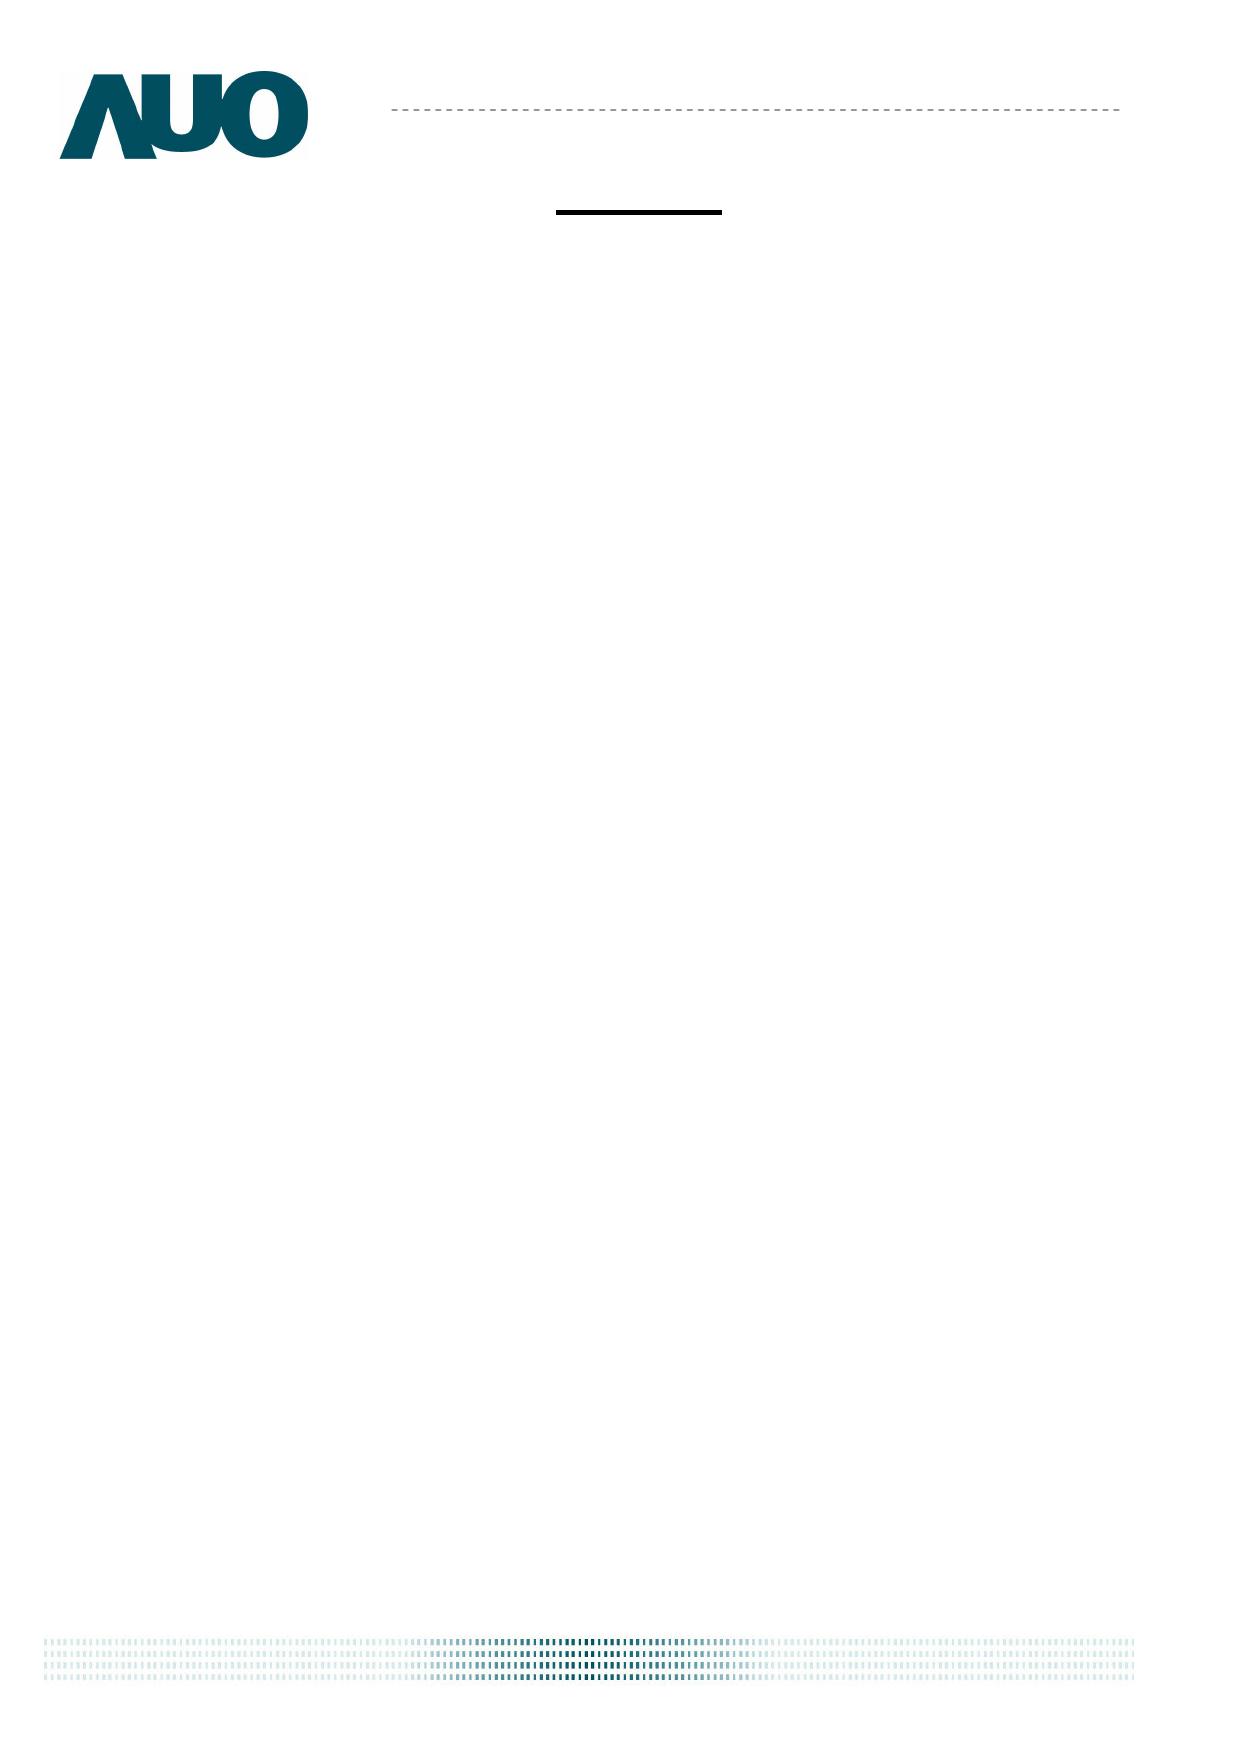 G057QN01-V1 Даташит, Описание, Даташиты